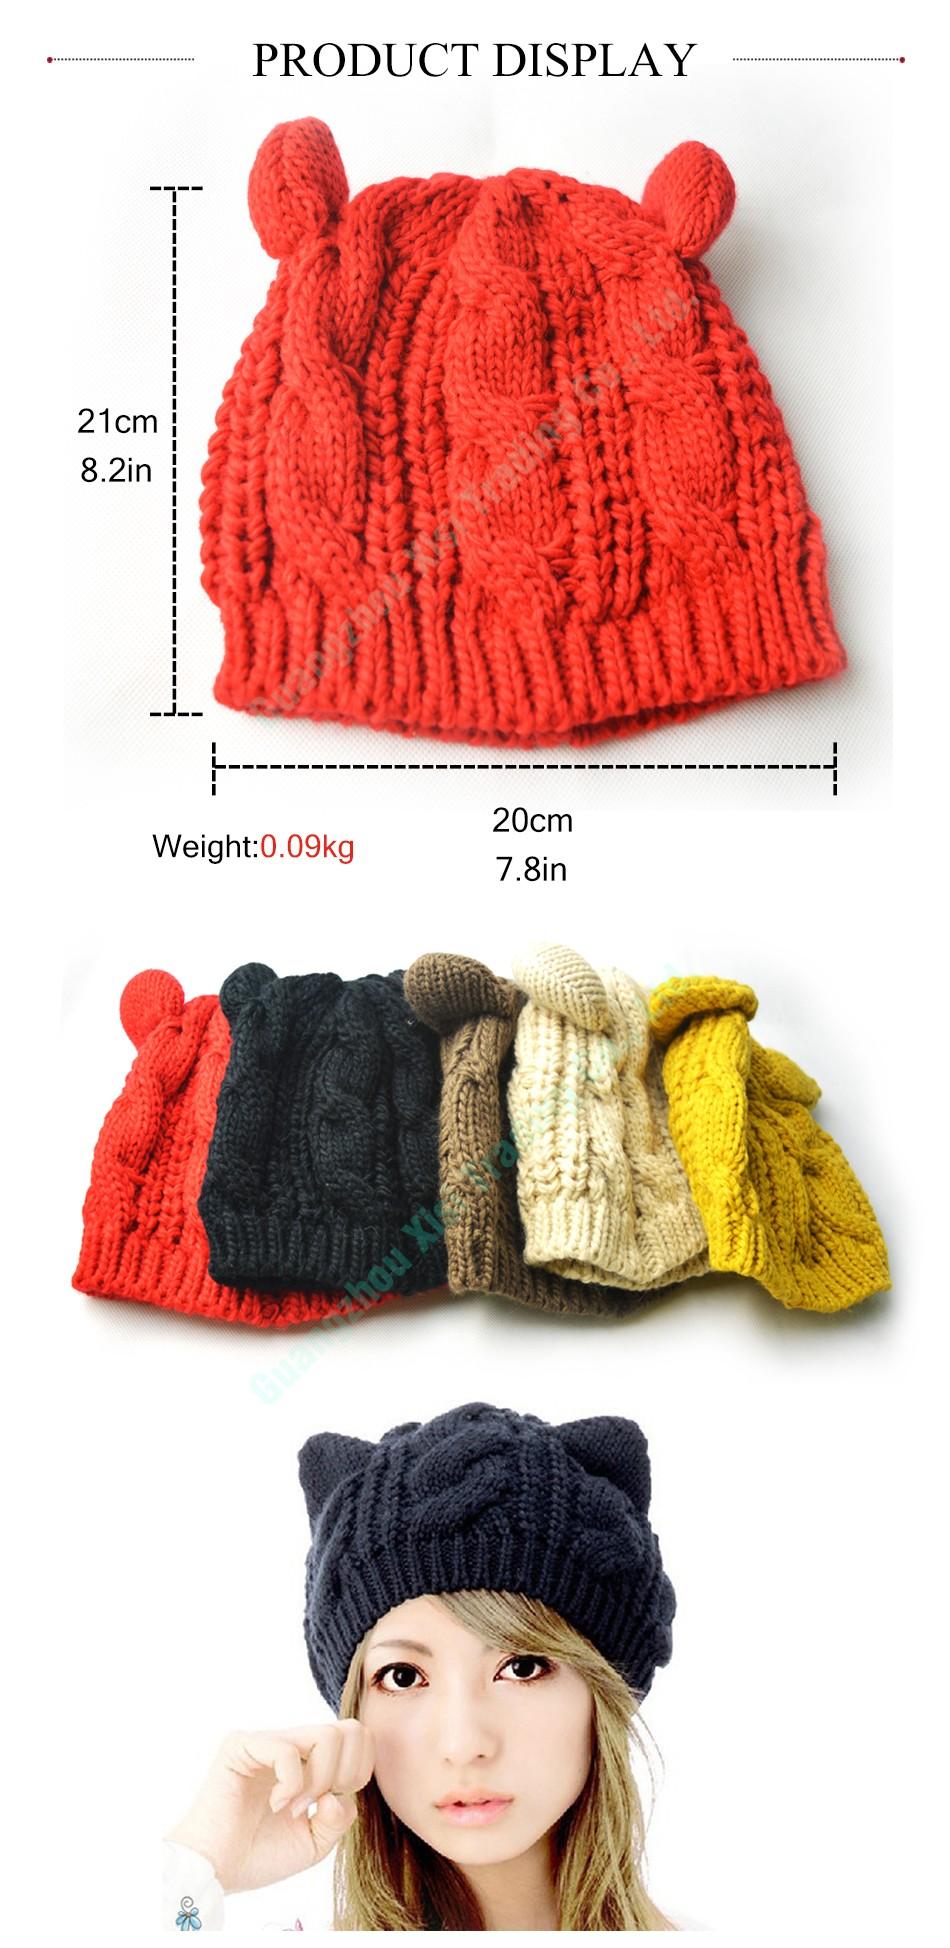 Women s Winter Knit Crochet Braided Cat Ears Beret Beanie Ski Knitted Hat  Cap Cat Ears Knitted Beanie Winter Hats For Women 1f1629b72d7b